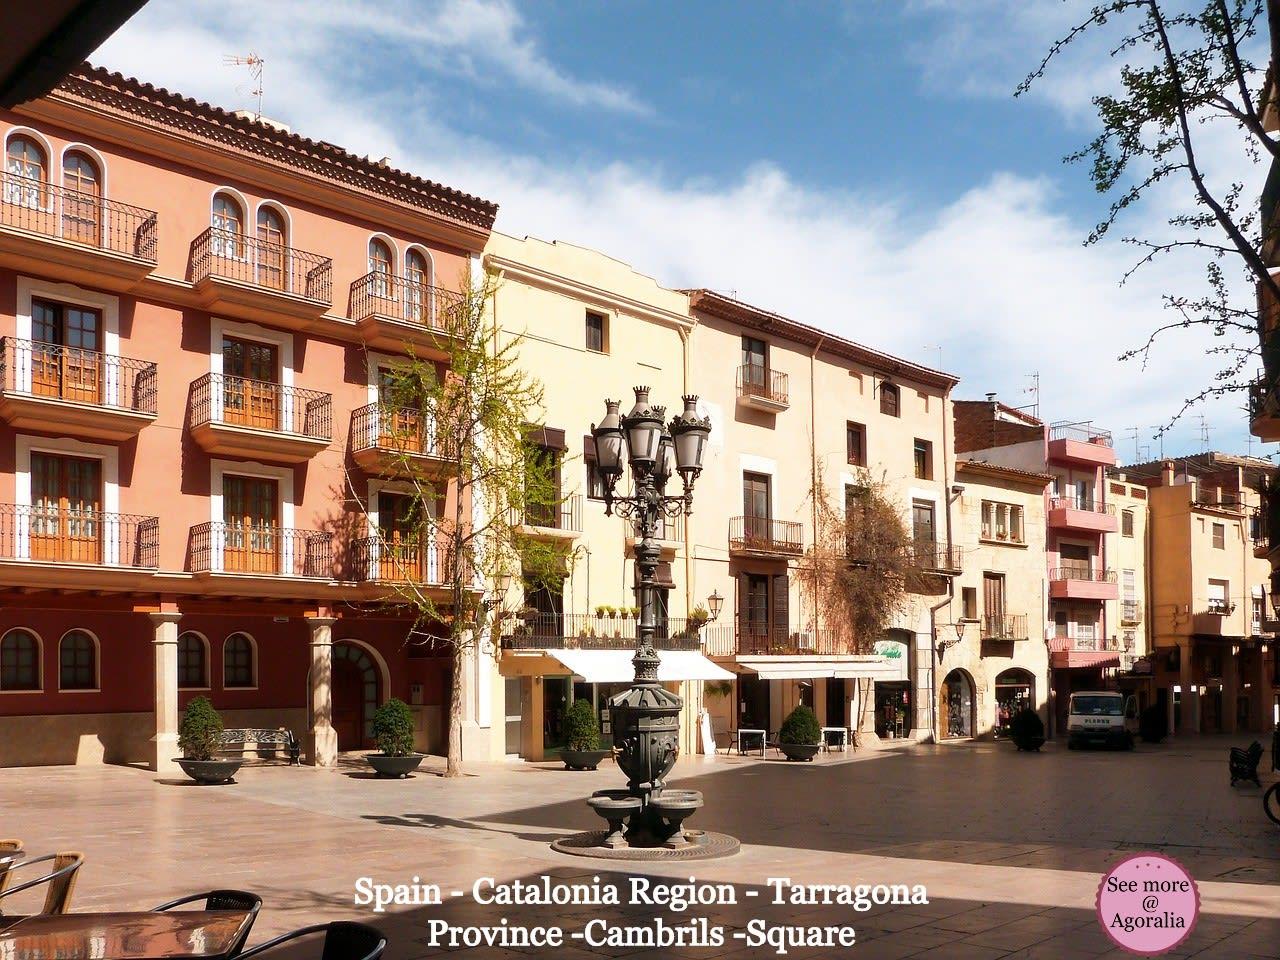 Spain-Catalonia-Region-Tarragona-Province-Village-Siurana